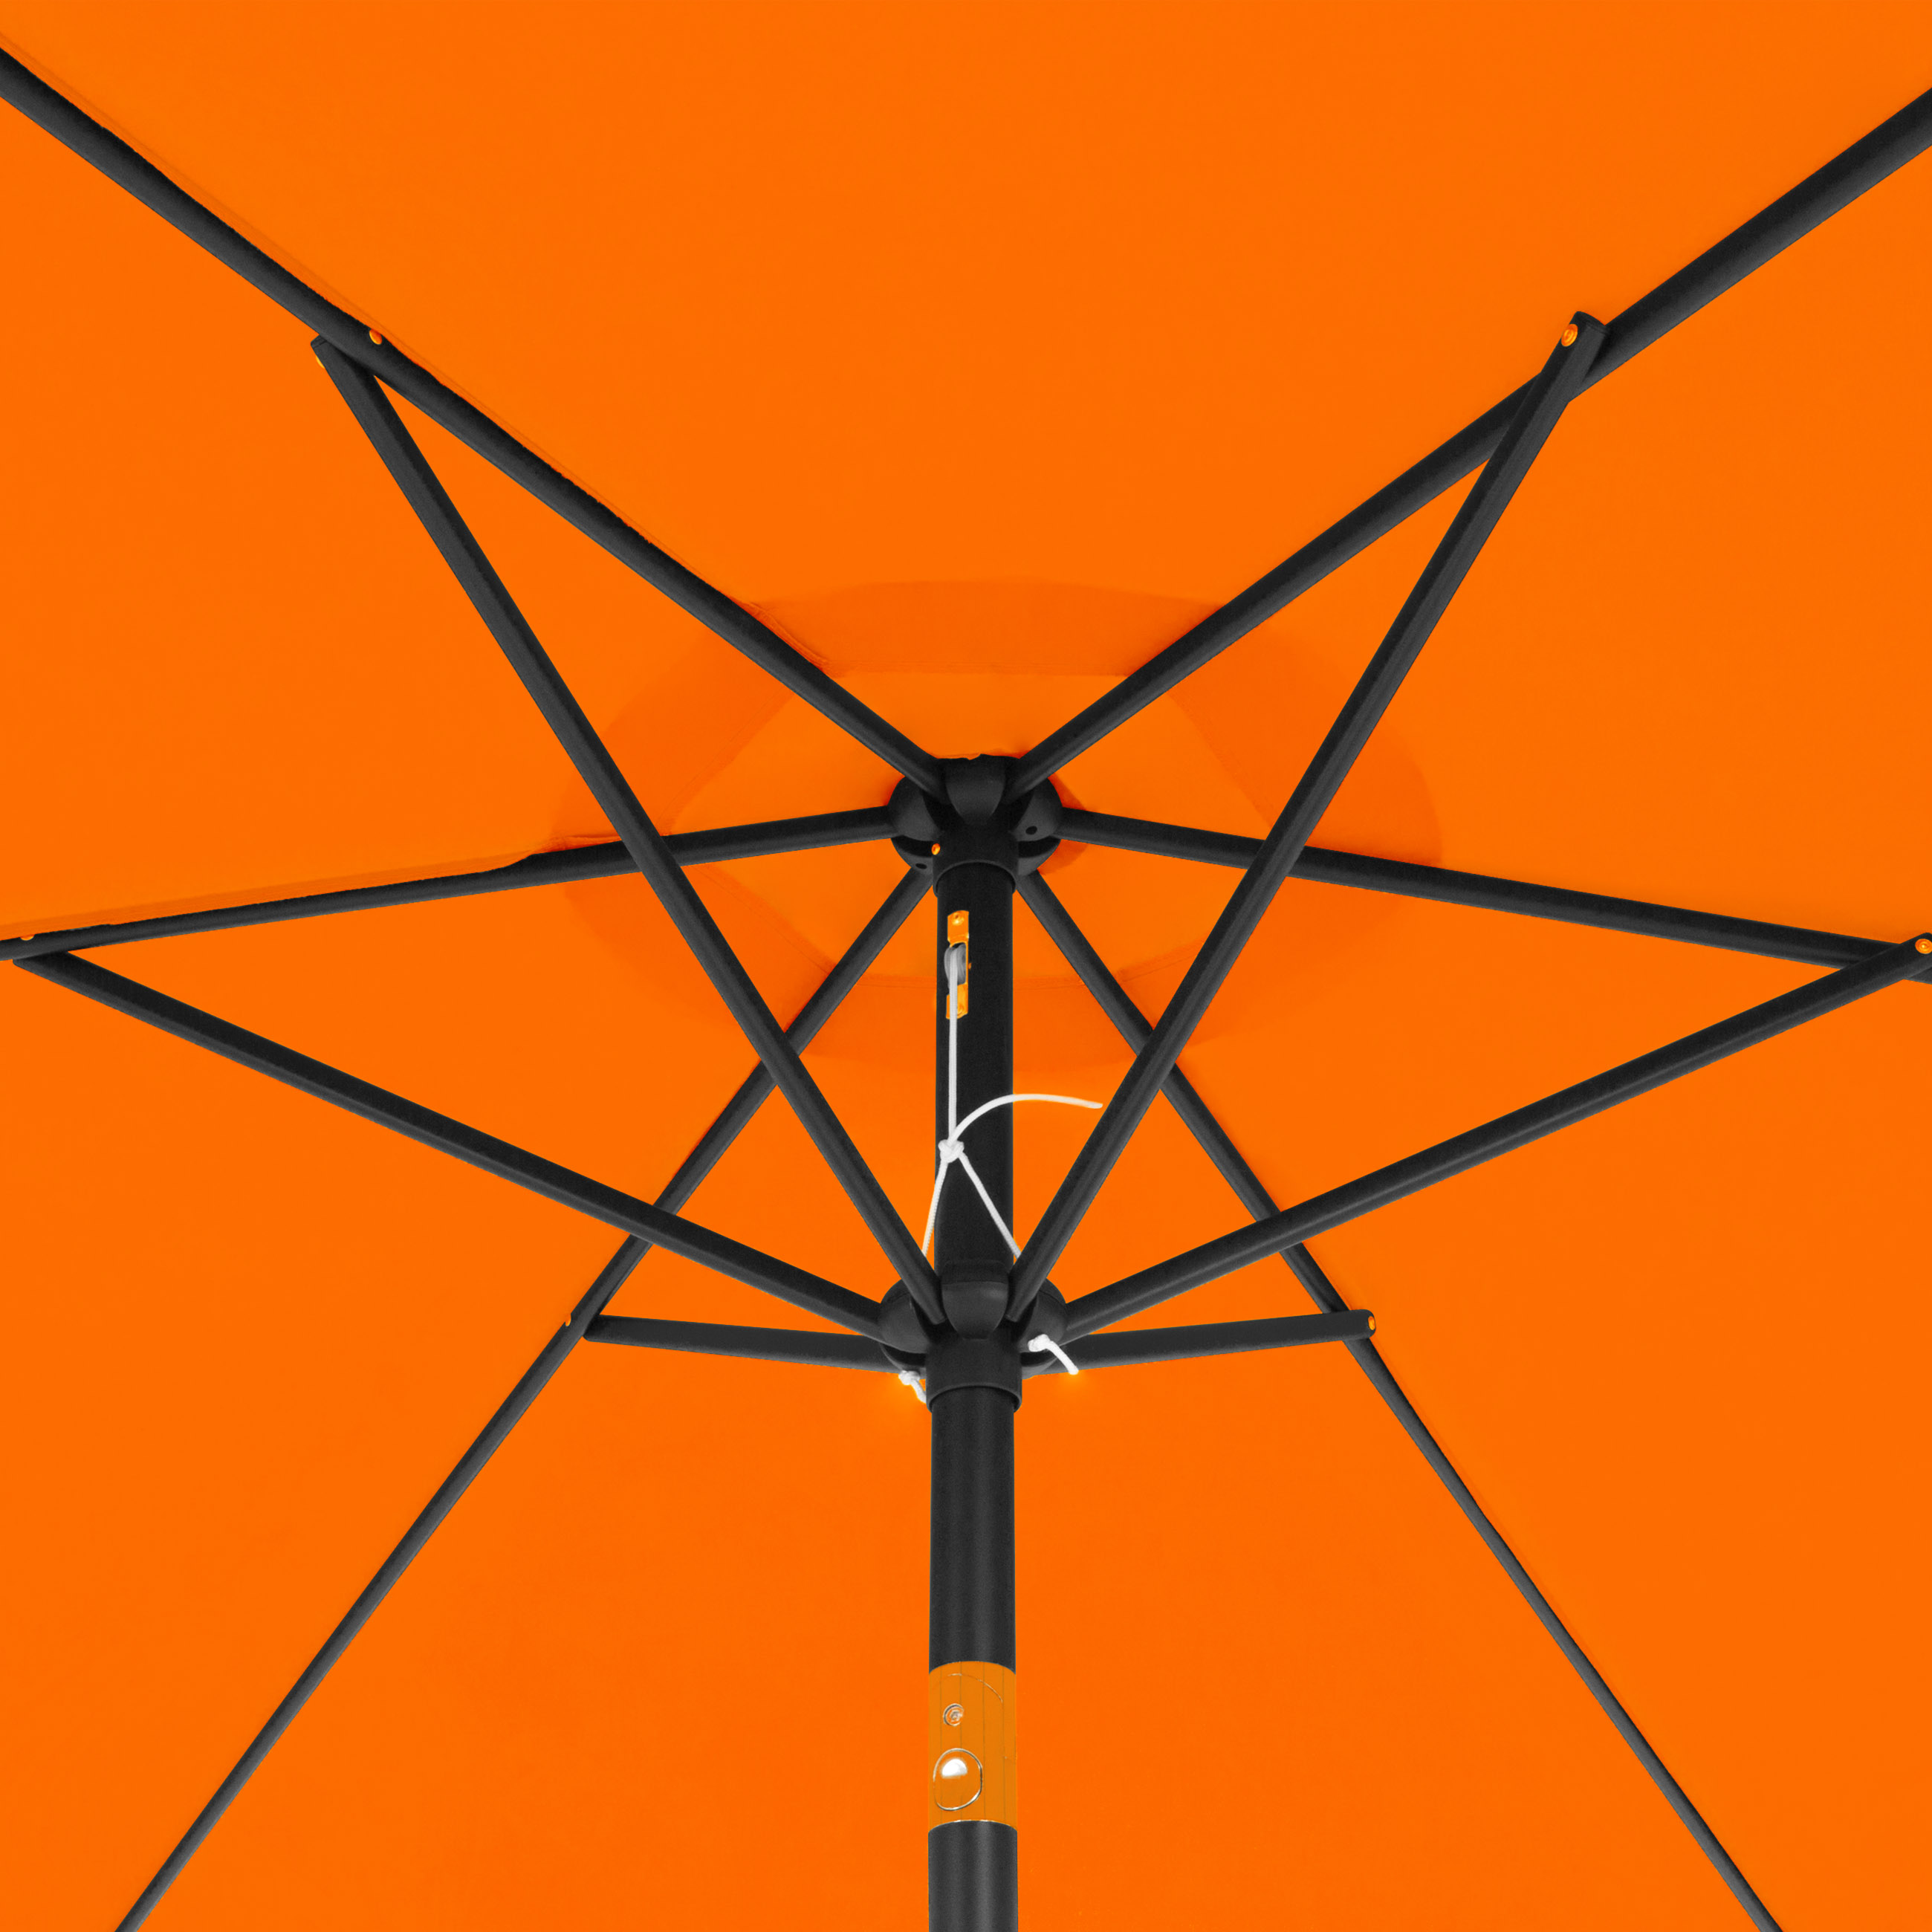 BCP-10ft-Outdoor-Steel-Market-Patio-Umbrella-Decoration-w-Tilt-Crank thumbnail 54